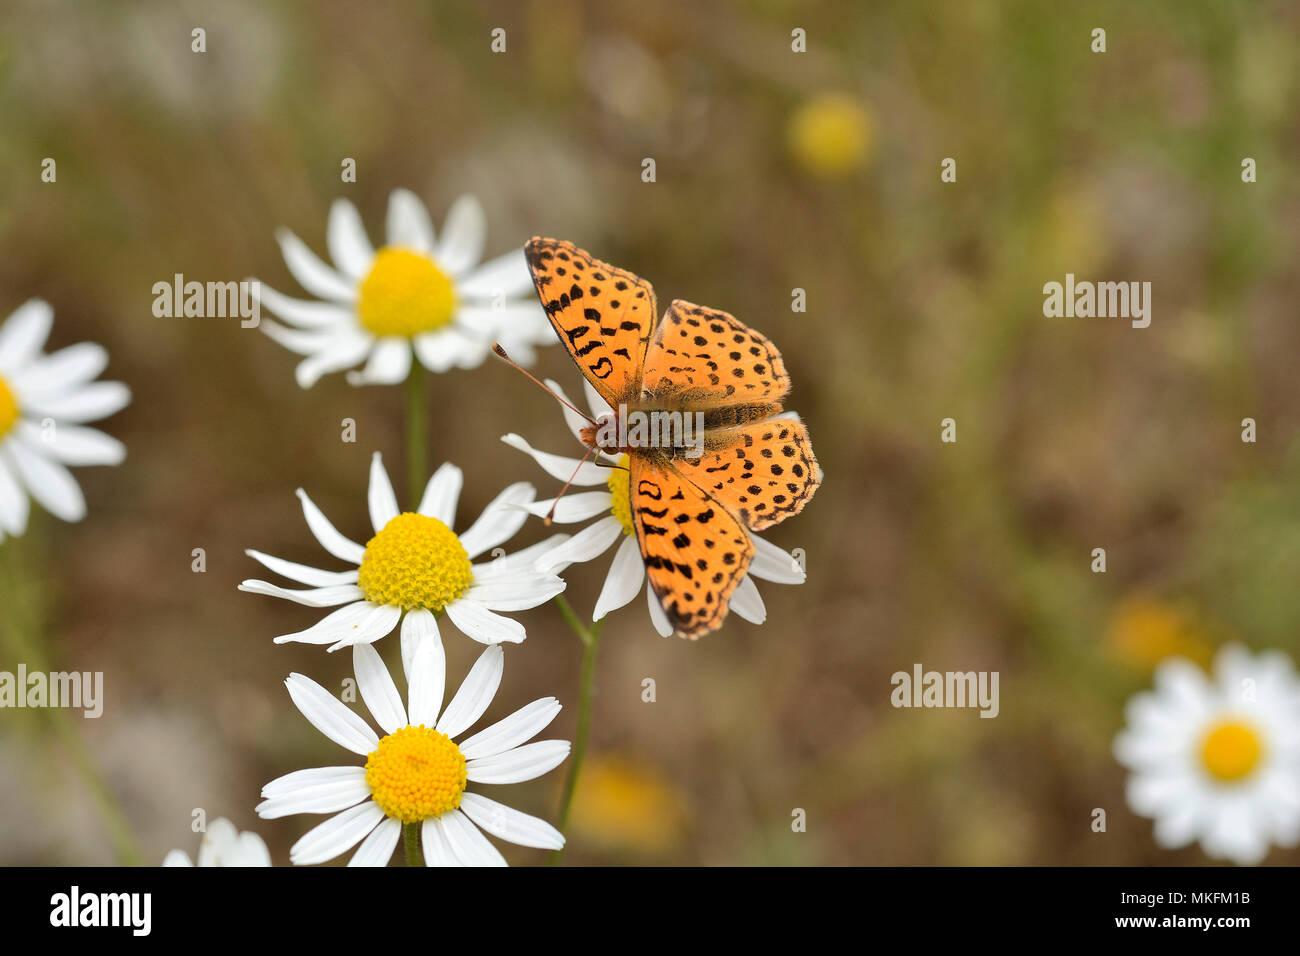 Mariposa Pintada (Yramea cytheris), Lepidoptera Nymphalidae, Cajón Grande Area, La Campana National Park, V Valparaiso Region, Chile - Stock Image